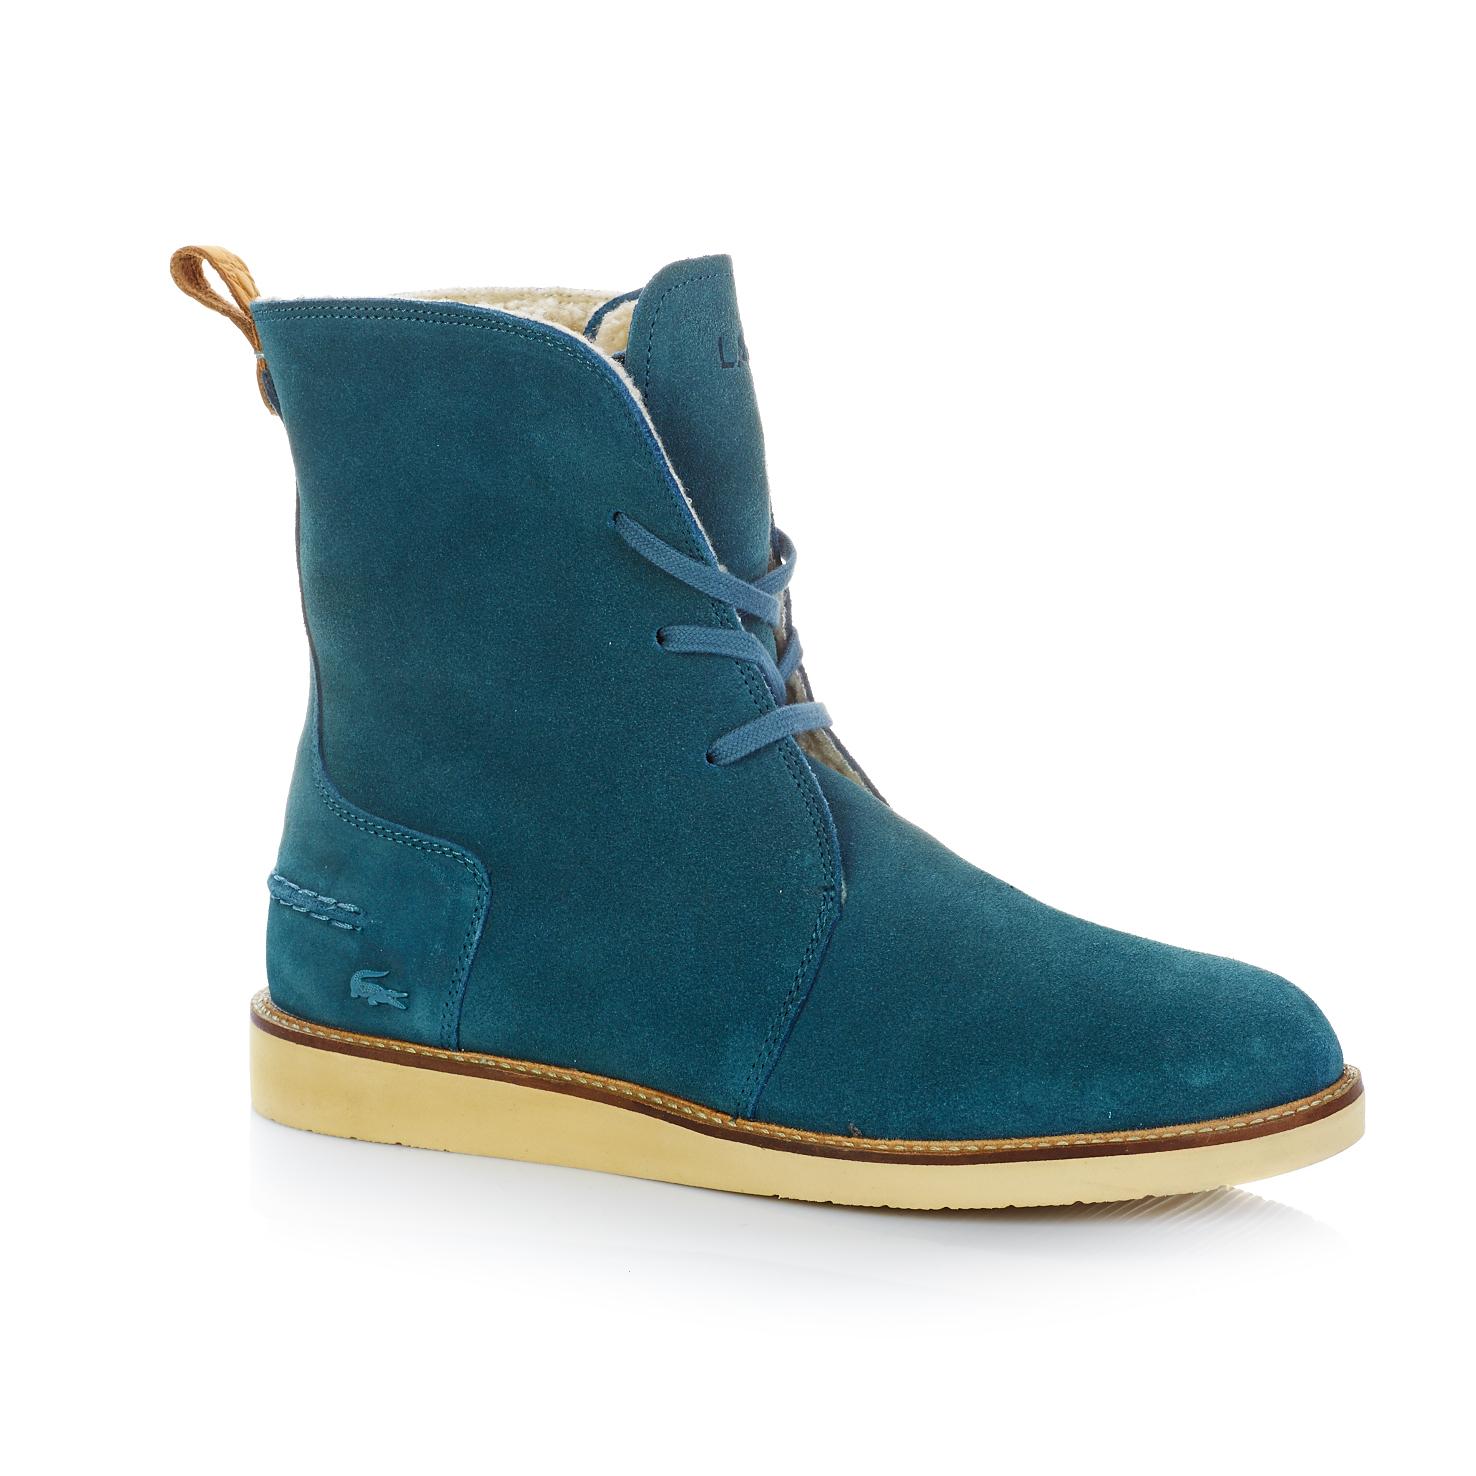 Ботинки  голубой цвета